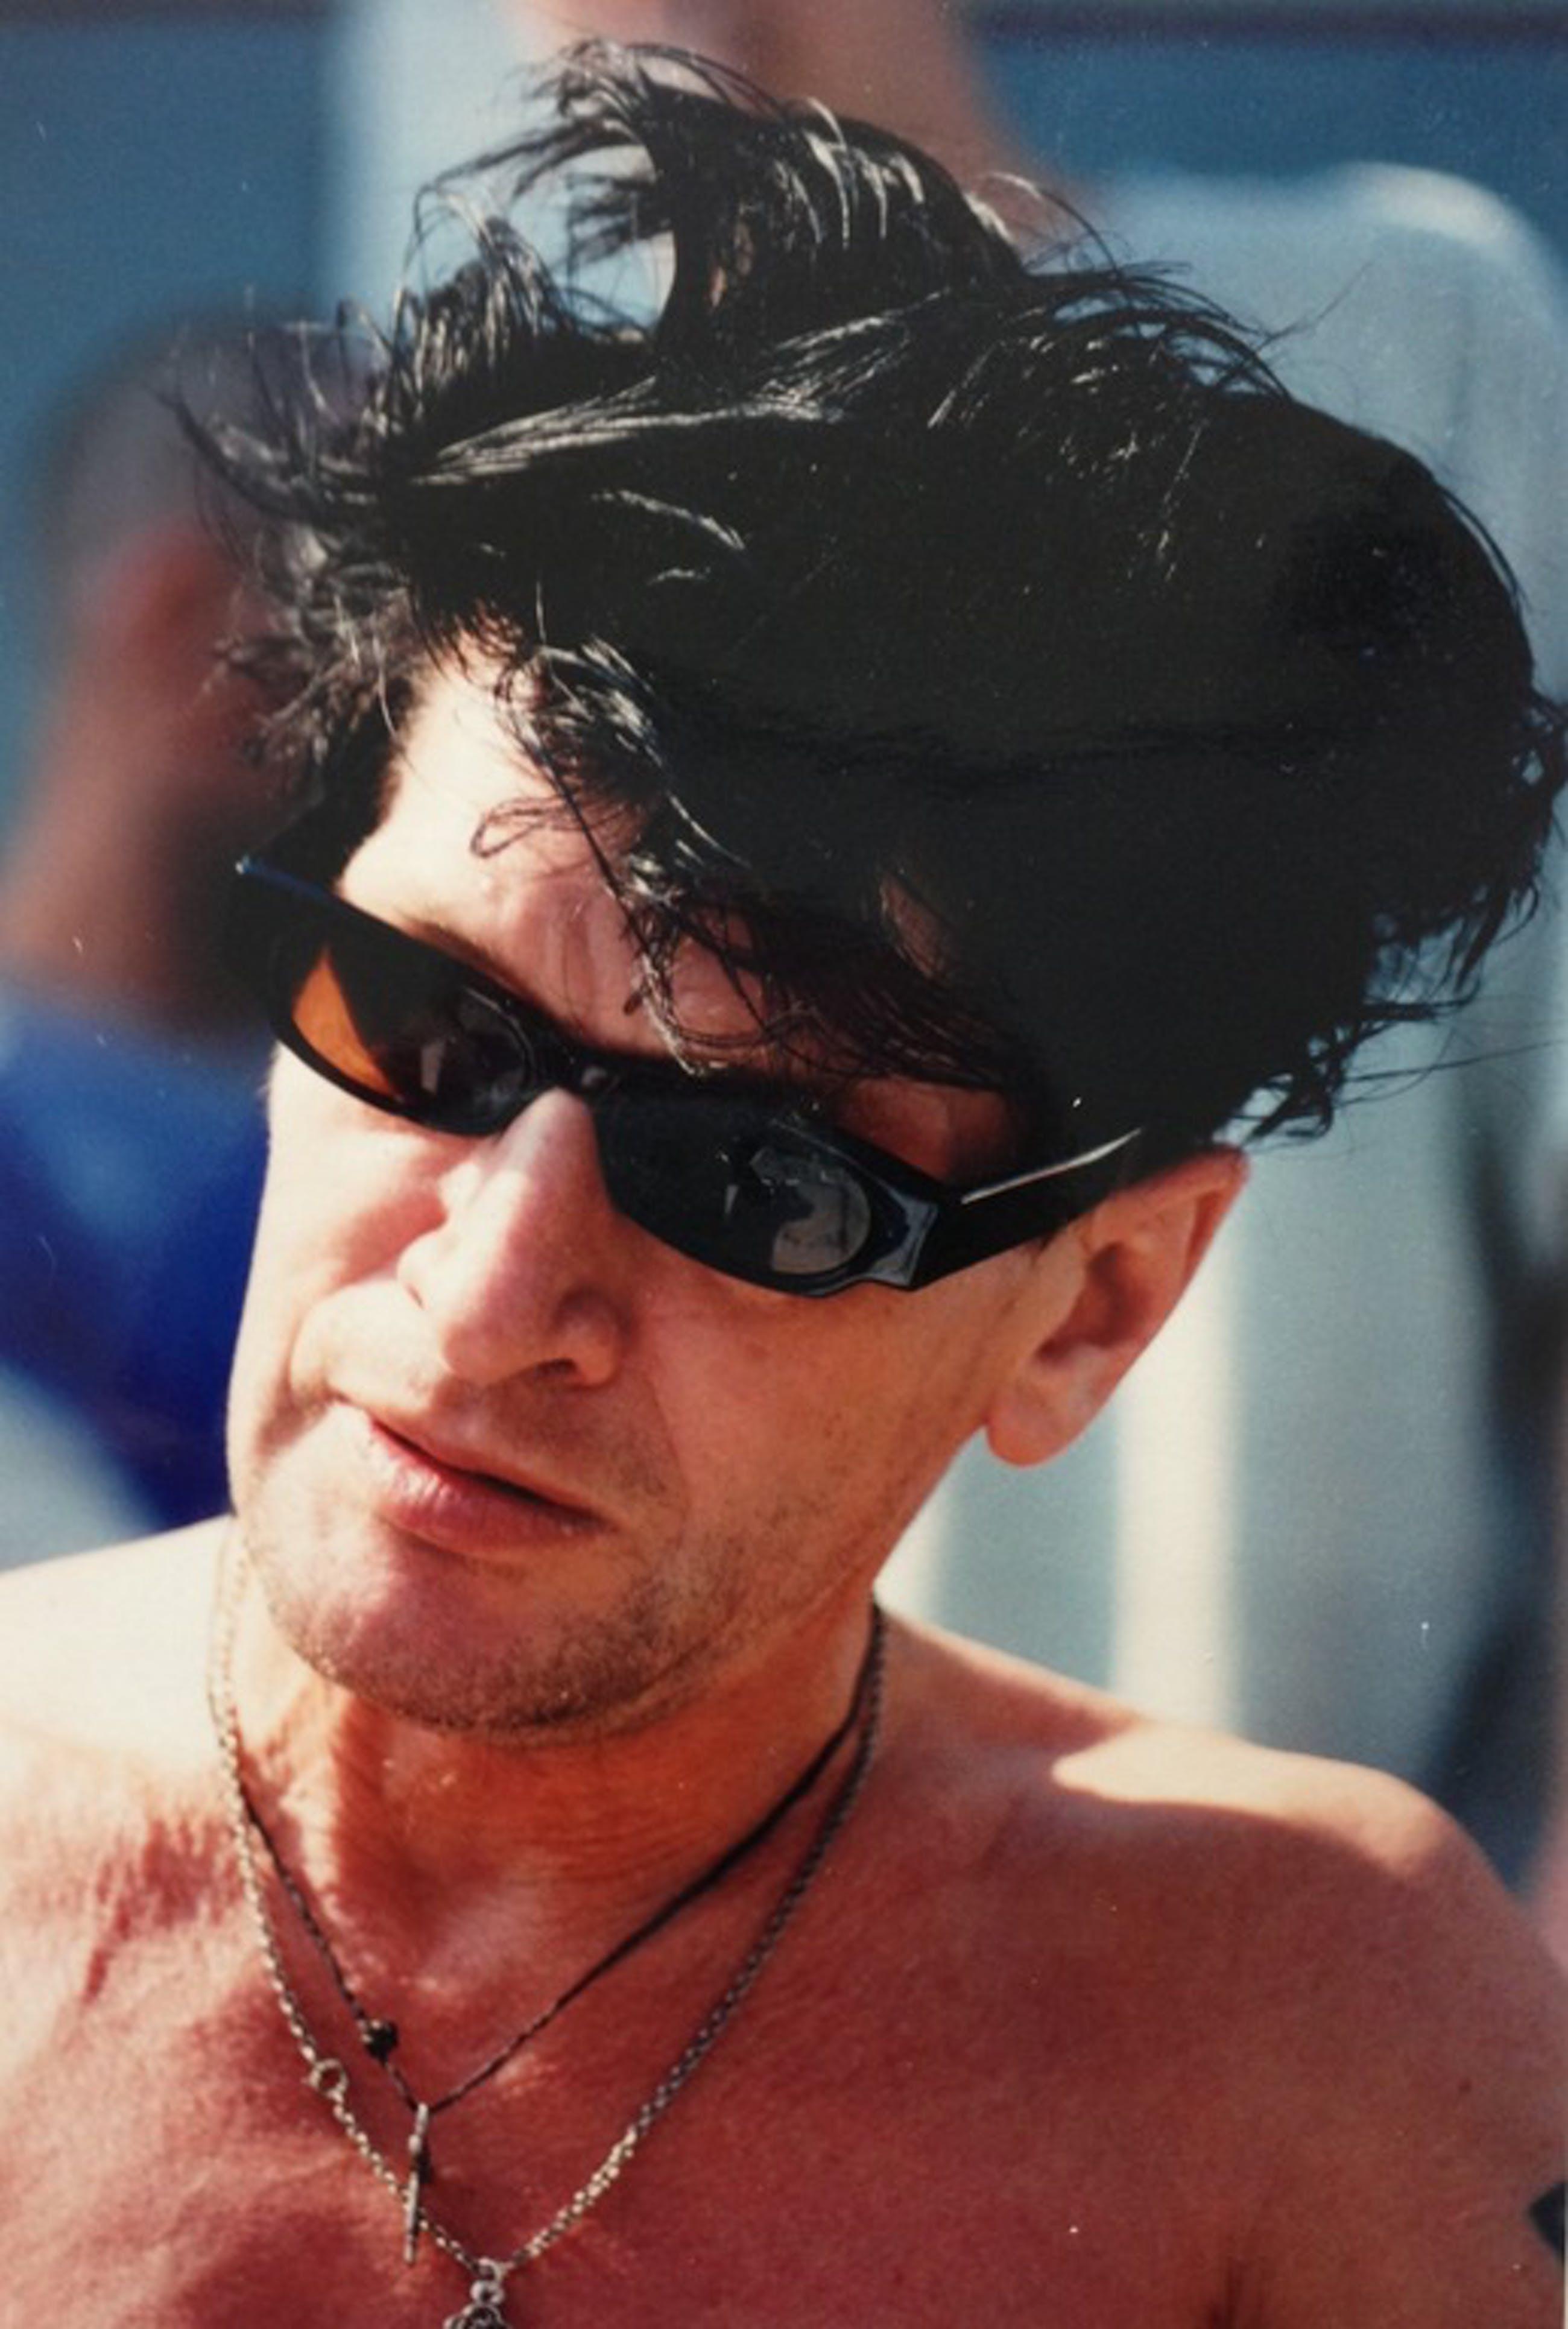 HERMAN BROOD, grote gelimiteerde en handgesigneerde zeefdruk 'Golfer' kopen? Bied vanaf 1!